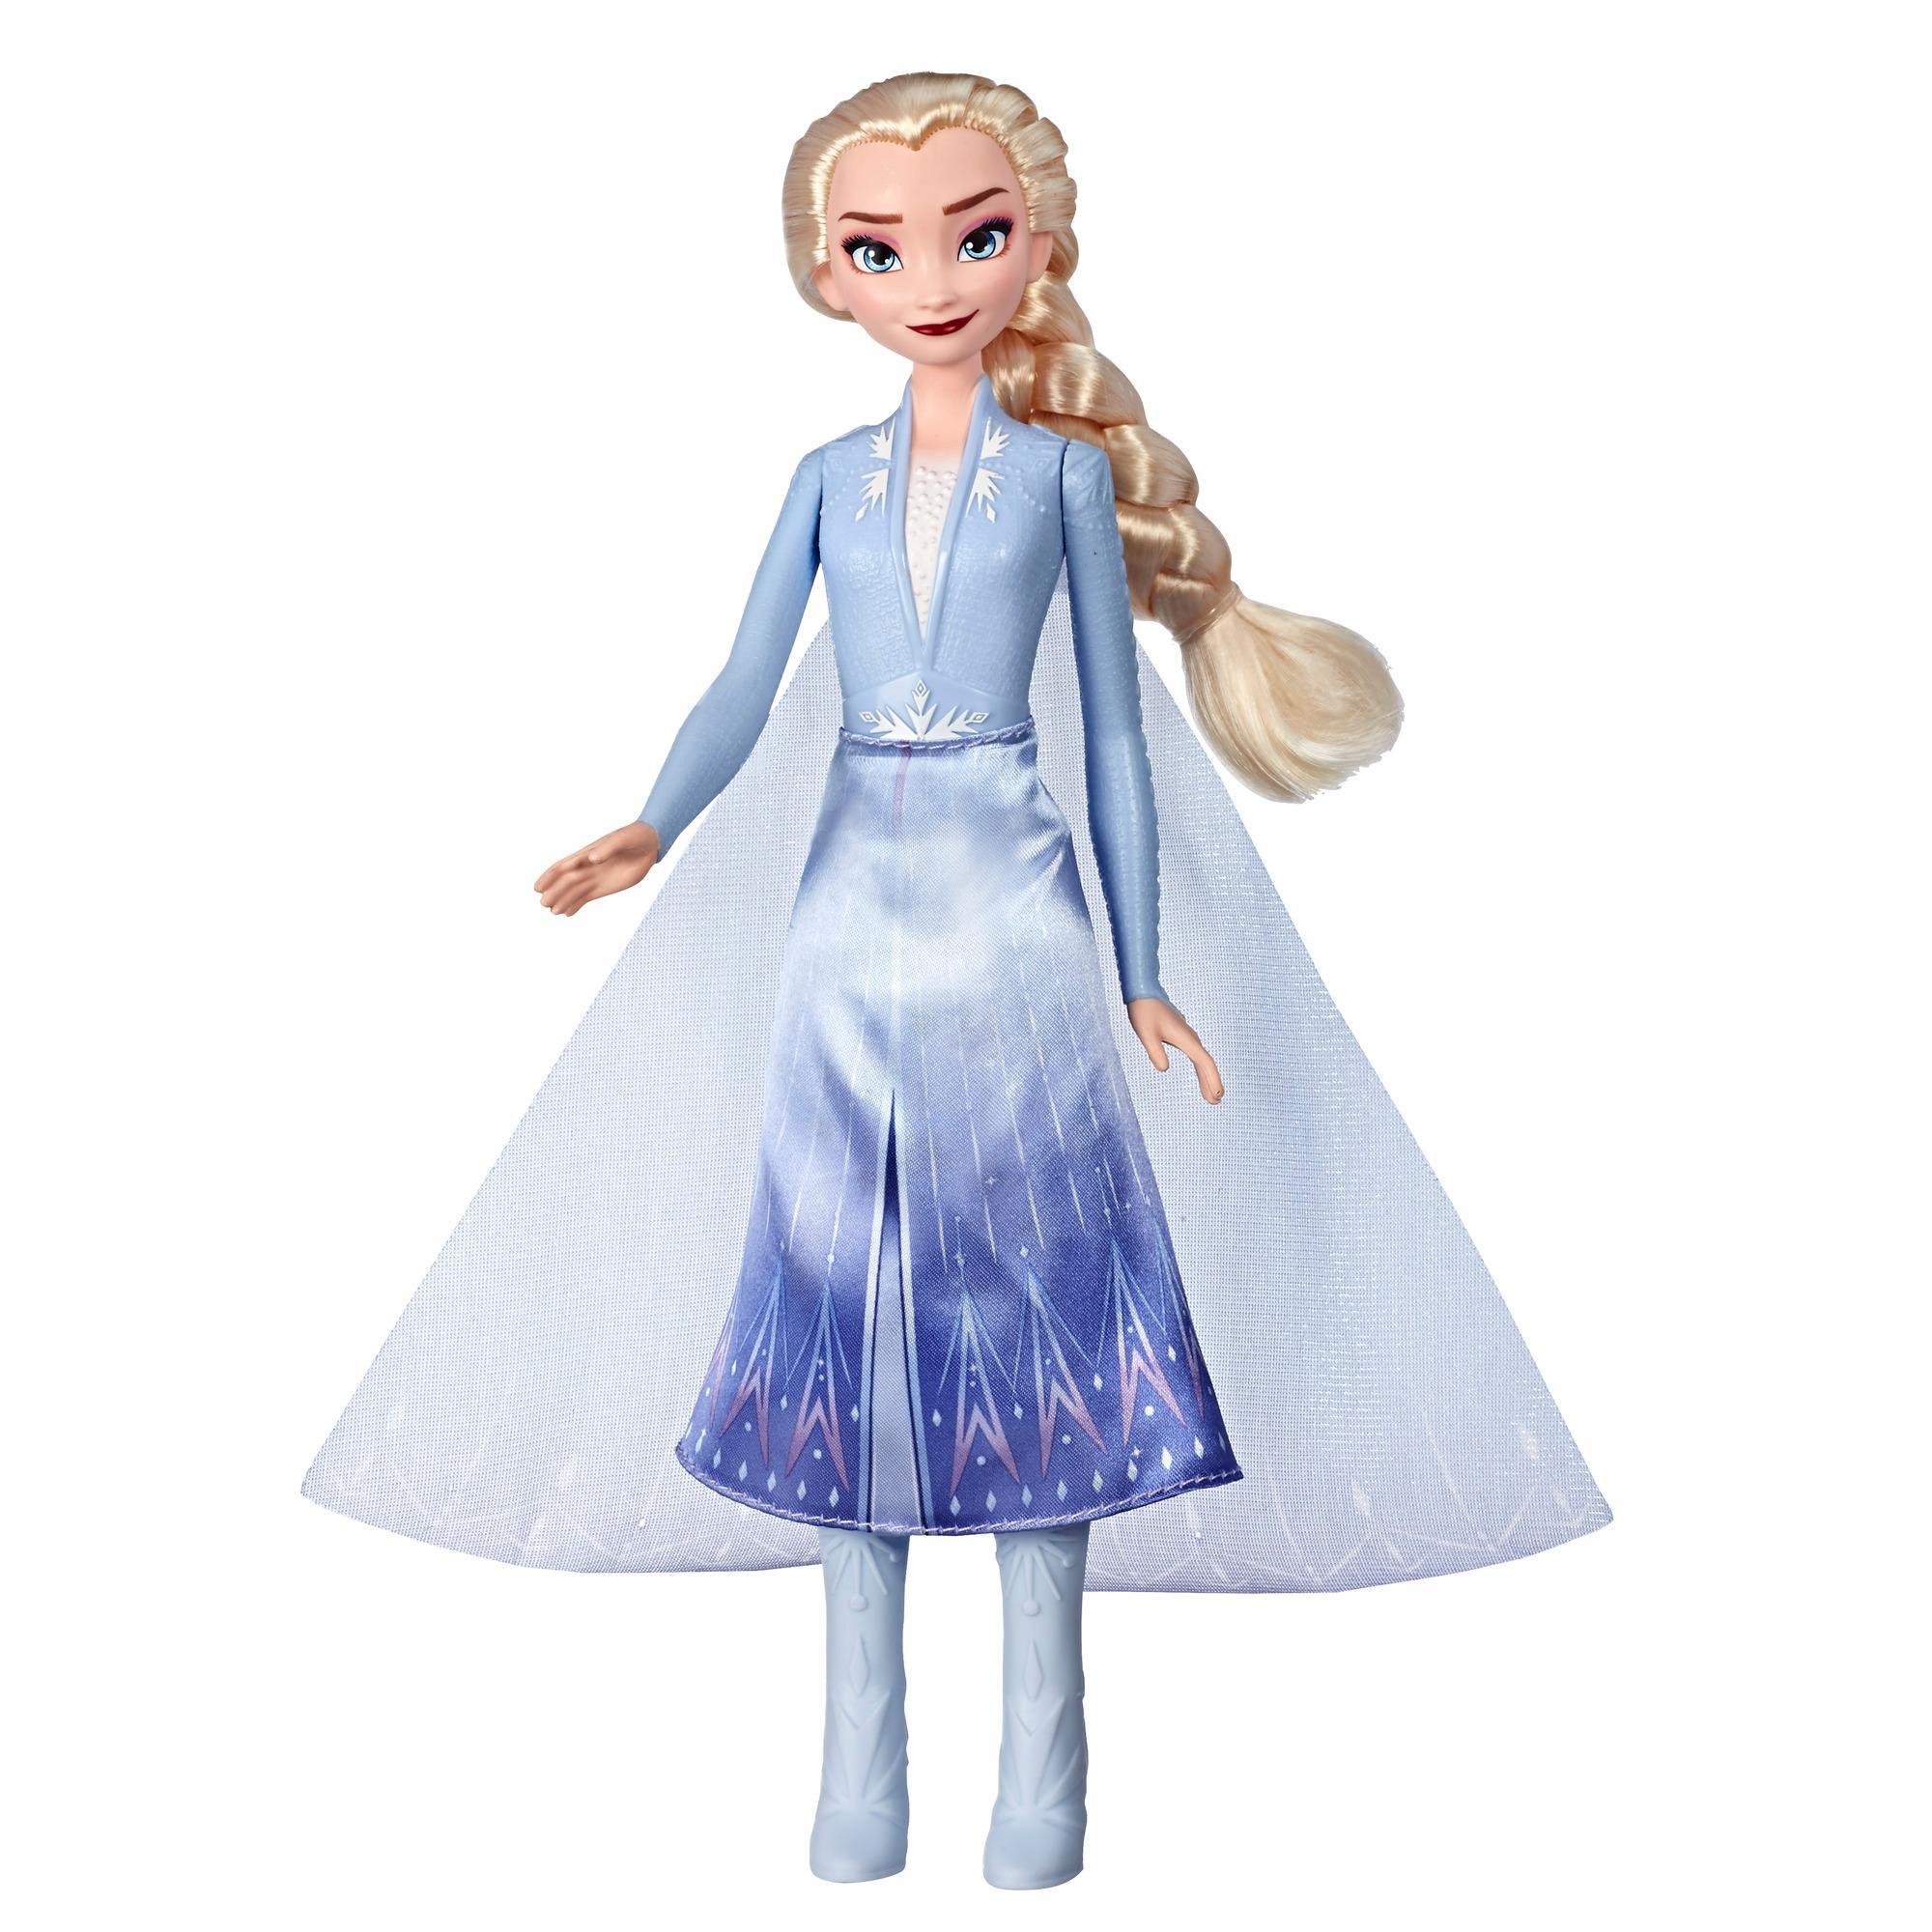 Disney Frozen Elsa Magical Swirling Adventure Fashion Doll